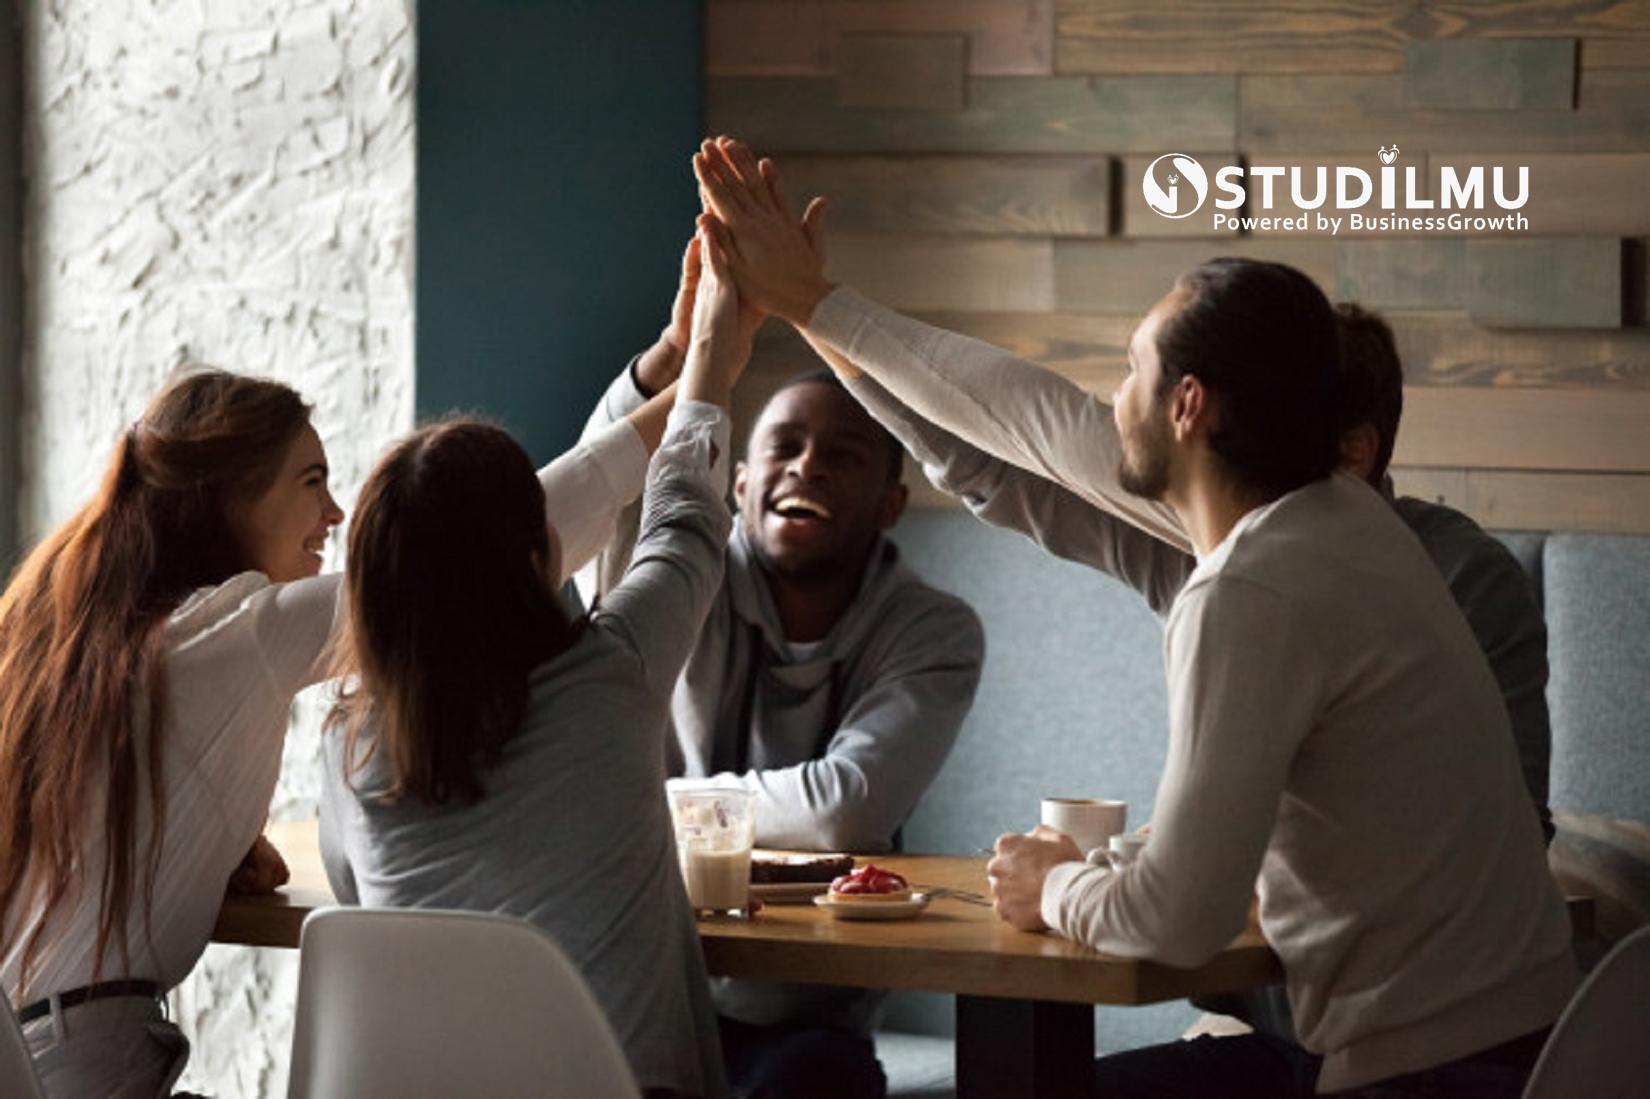 STUDILMU Career Advice - 5 Kunci Sukses Generasi Milenial